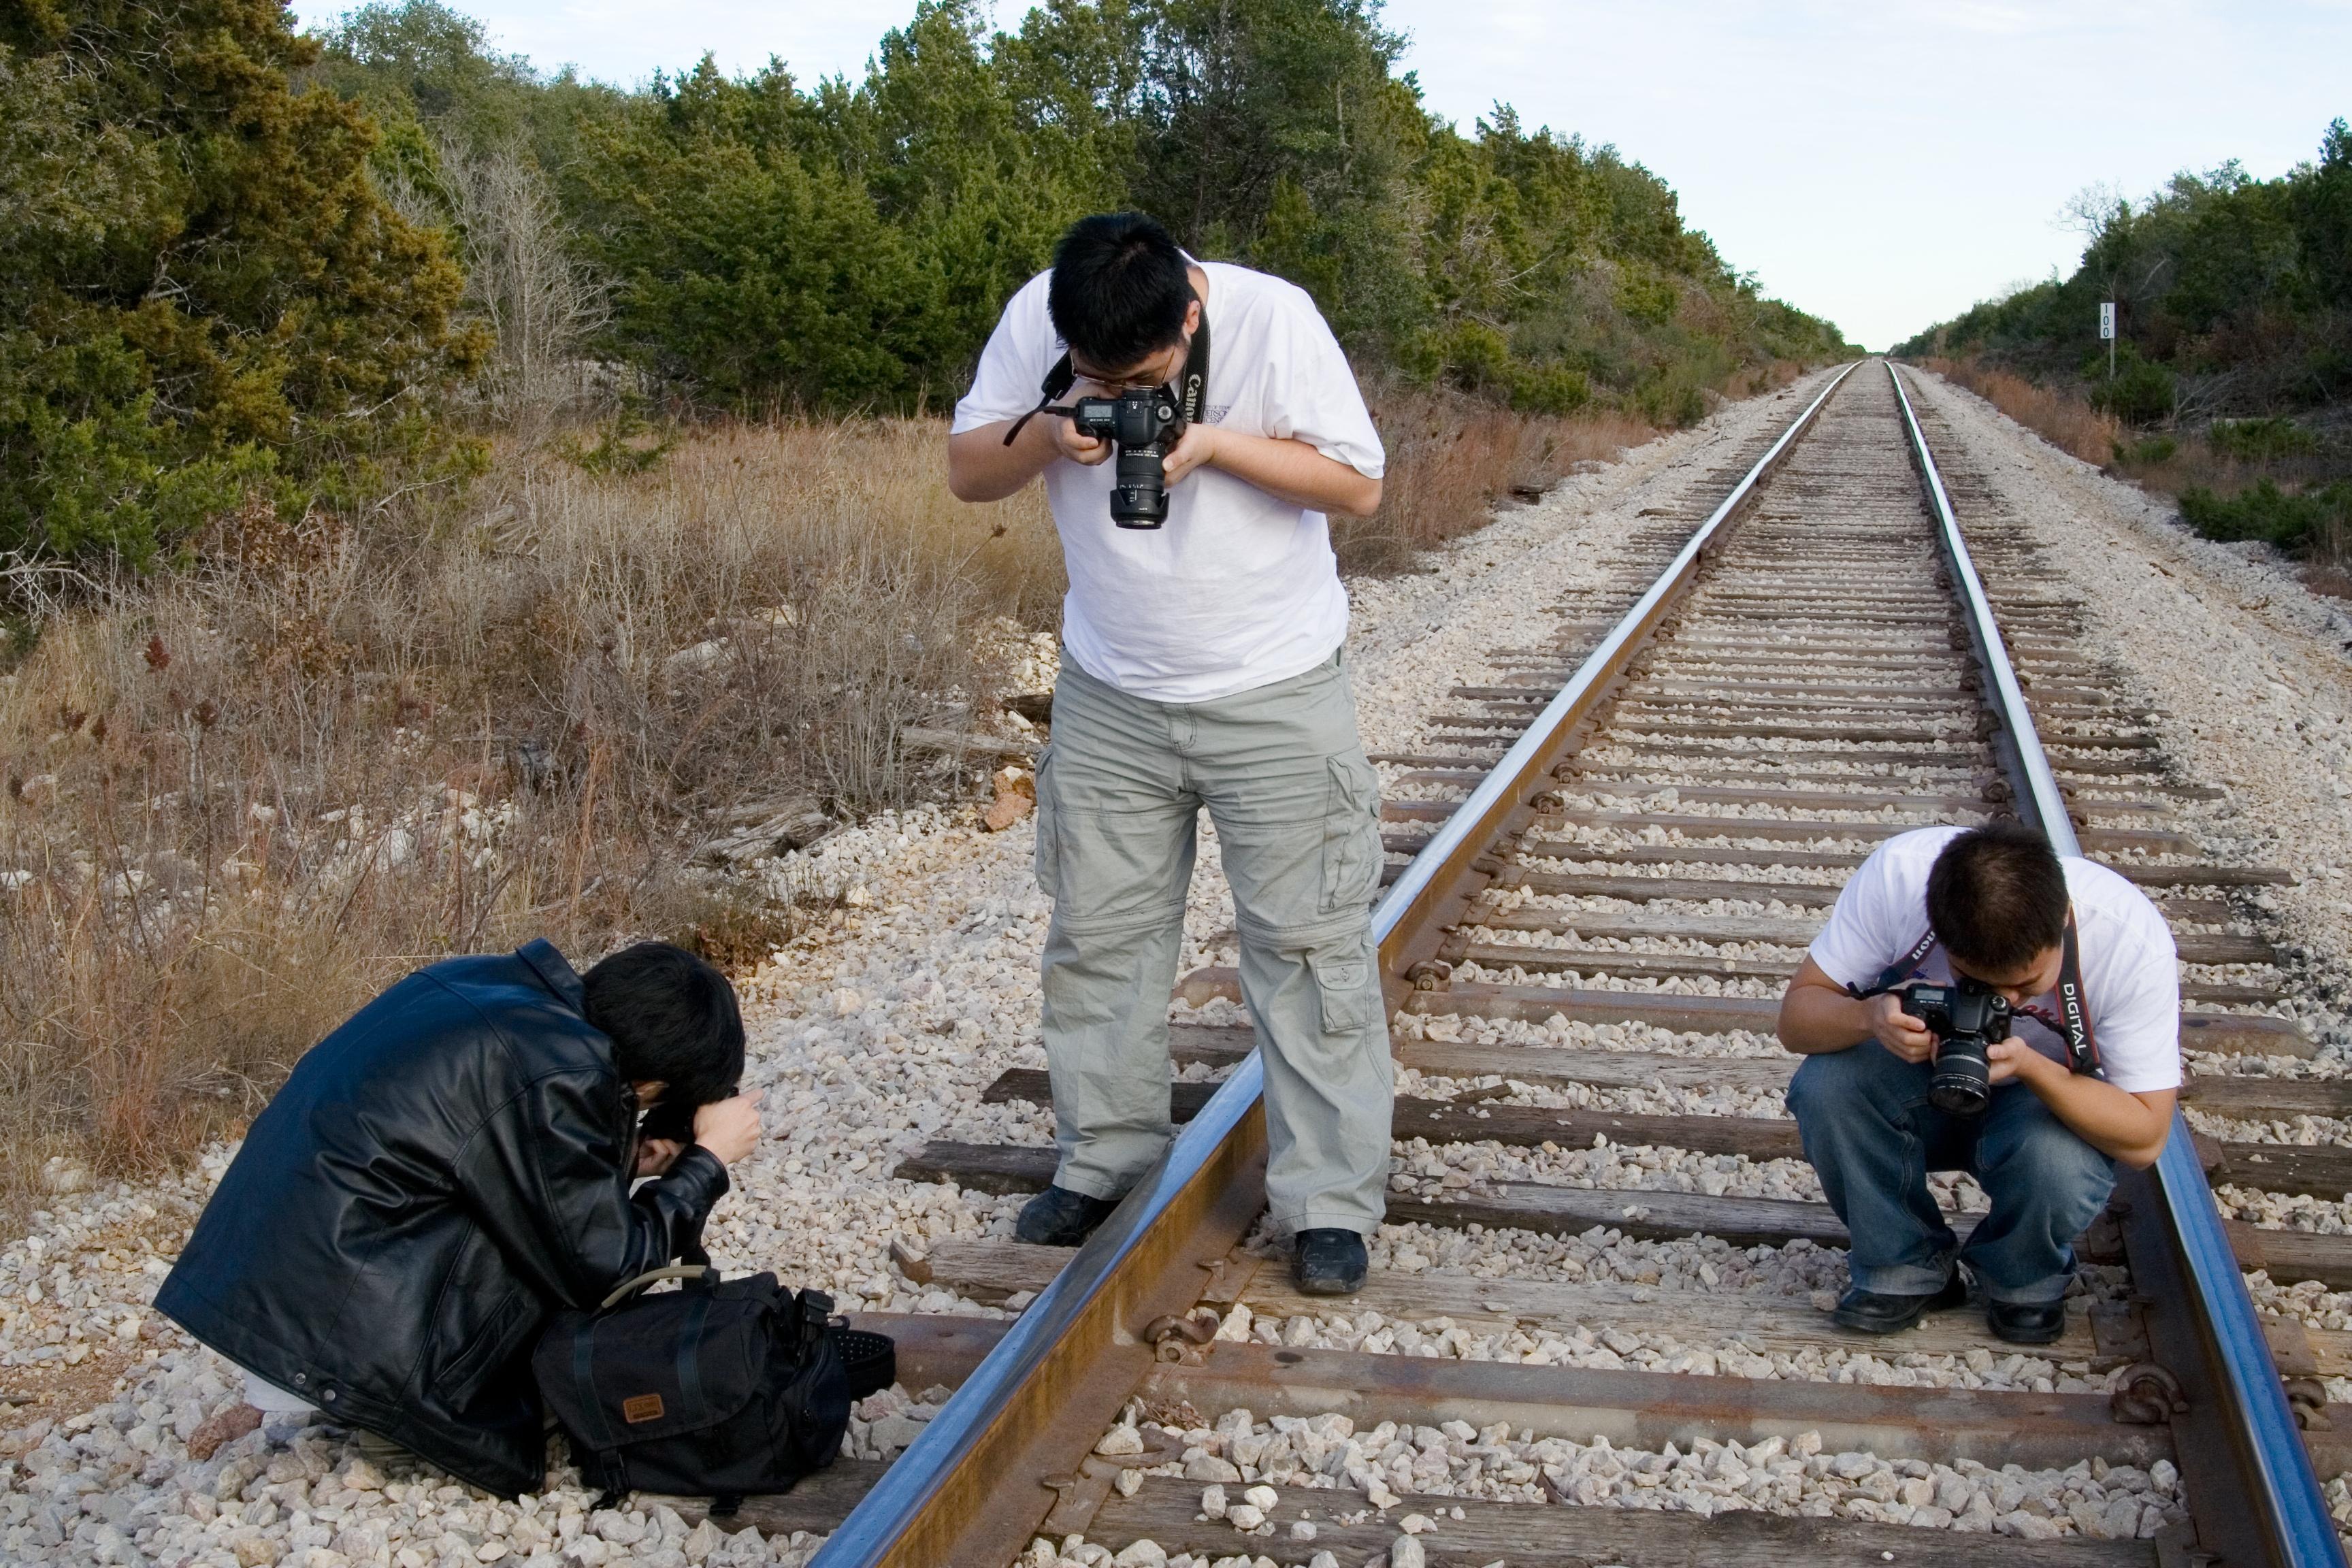 Forensic Photographer Job Description Crime Scene Reconstruction By Chey07cheyenne